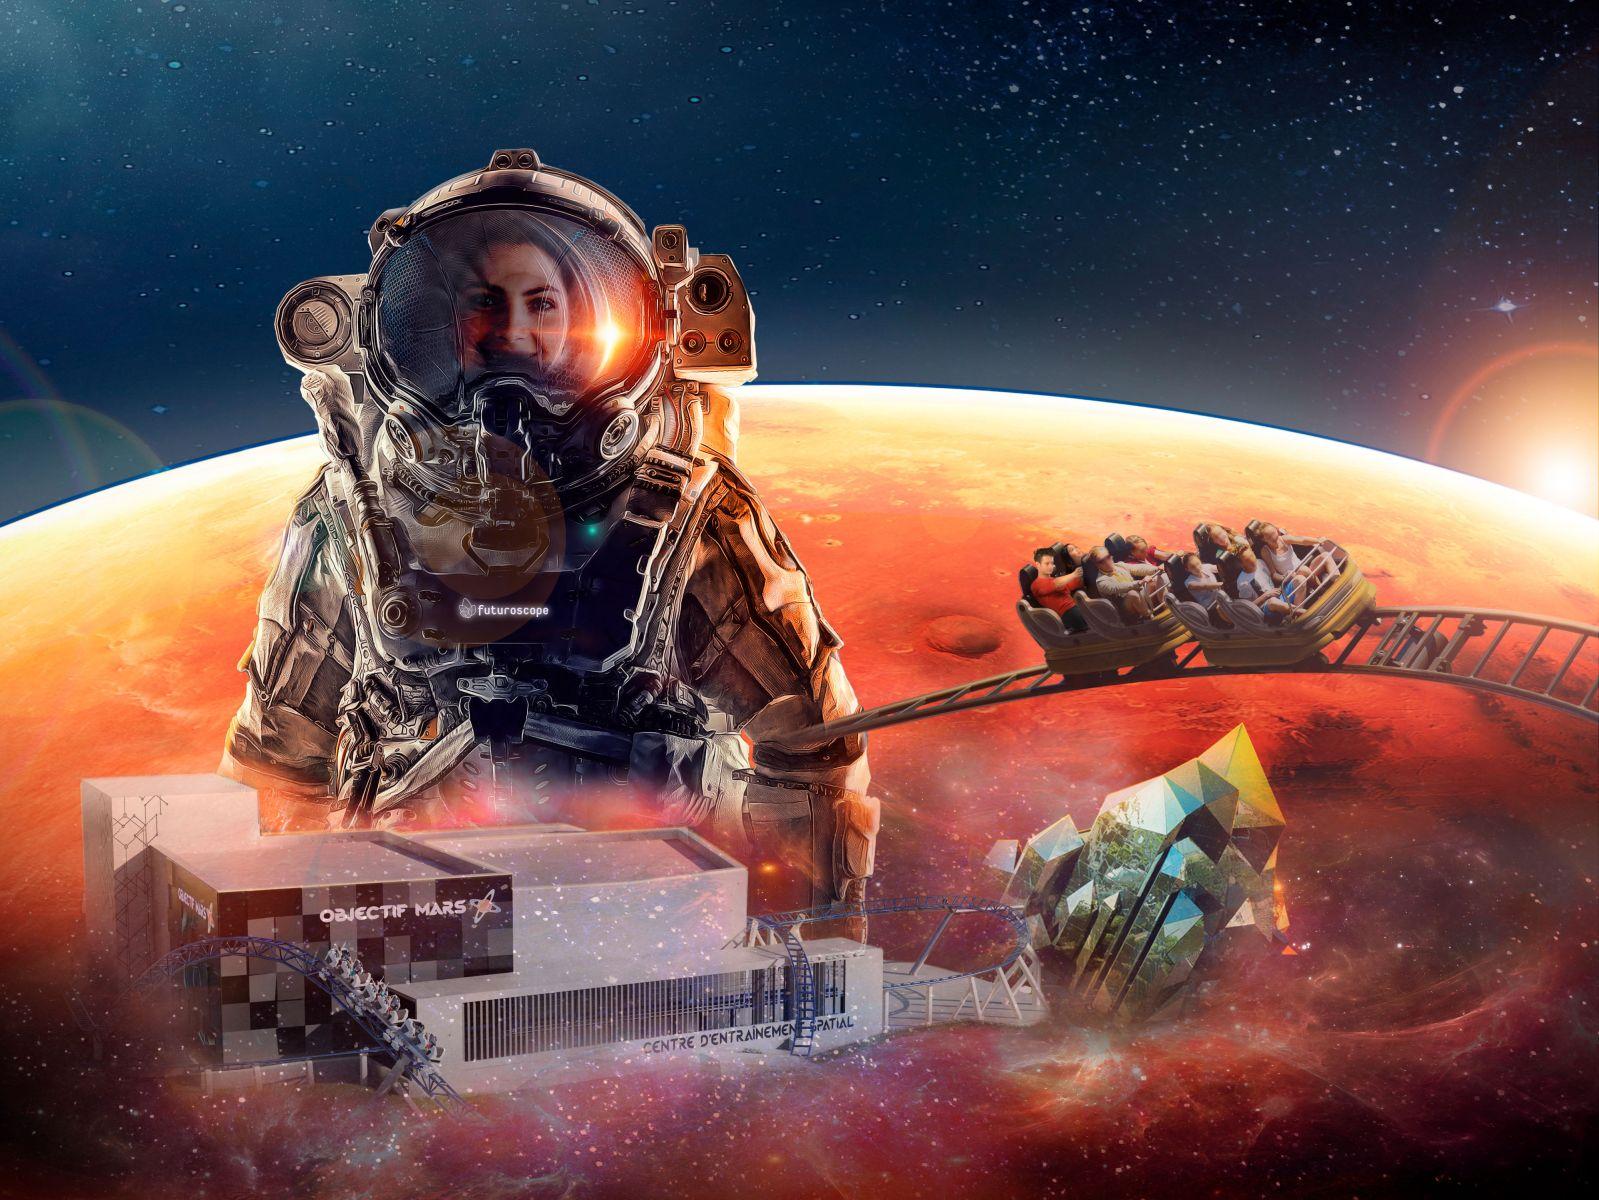 Objectif Mars (Projet Kepler : coaster au Futuroscope) · mars 2020 - Page 18 Futuroscope-obma19crea-008rc